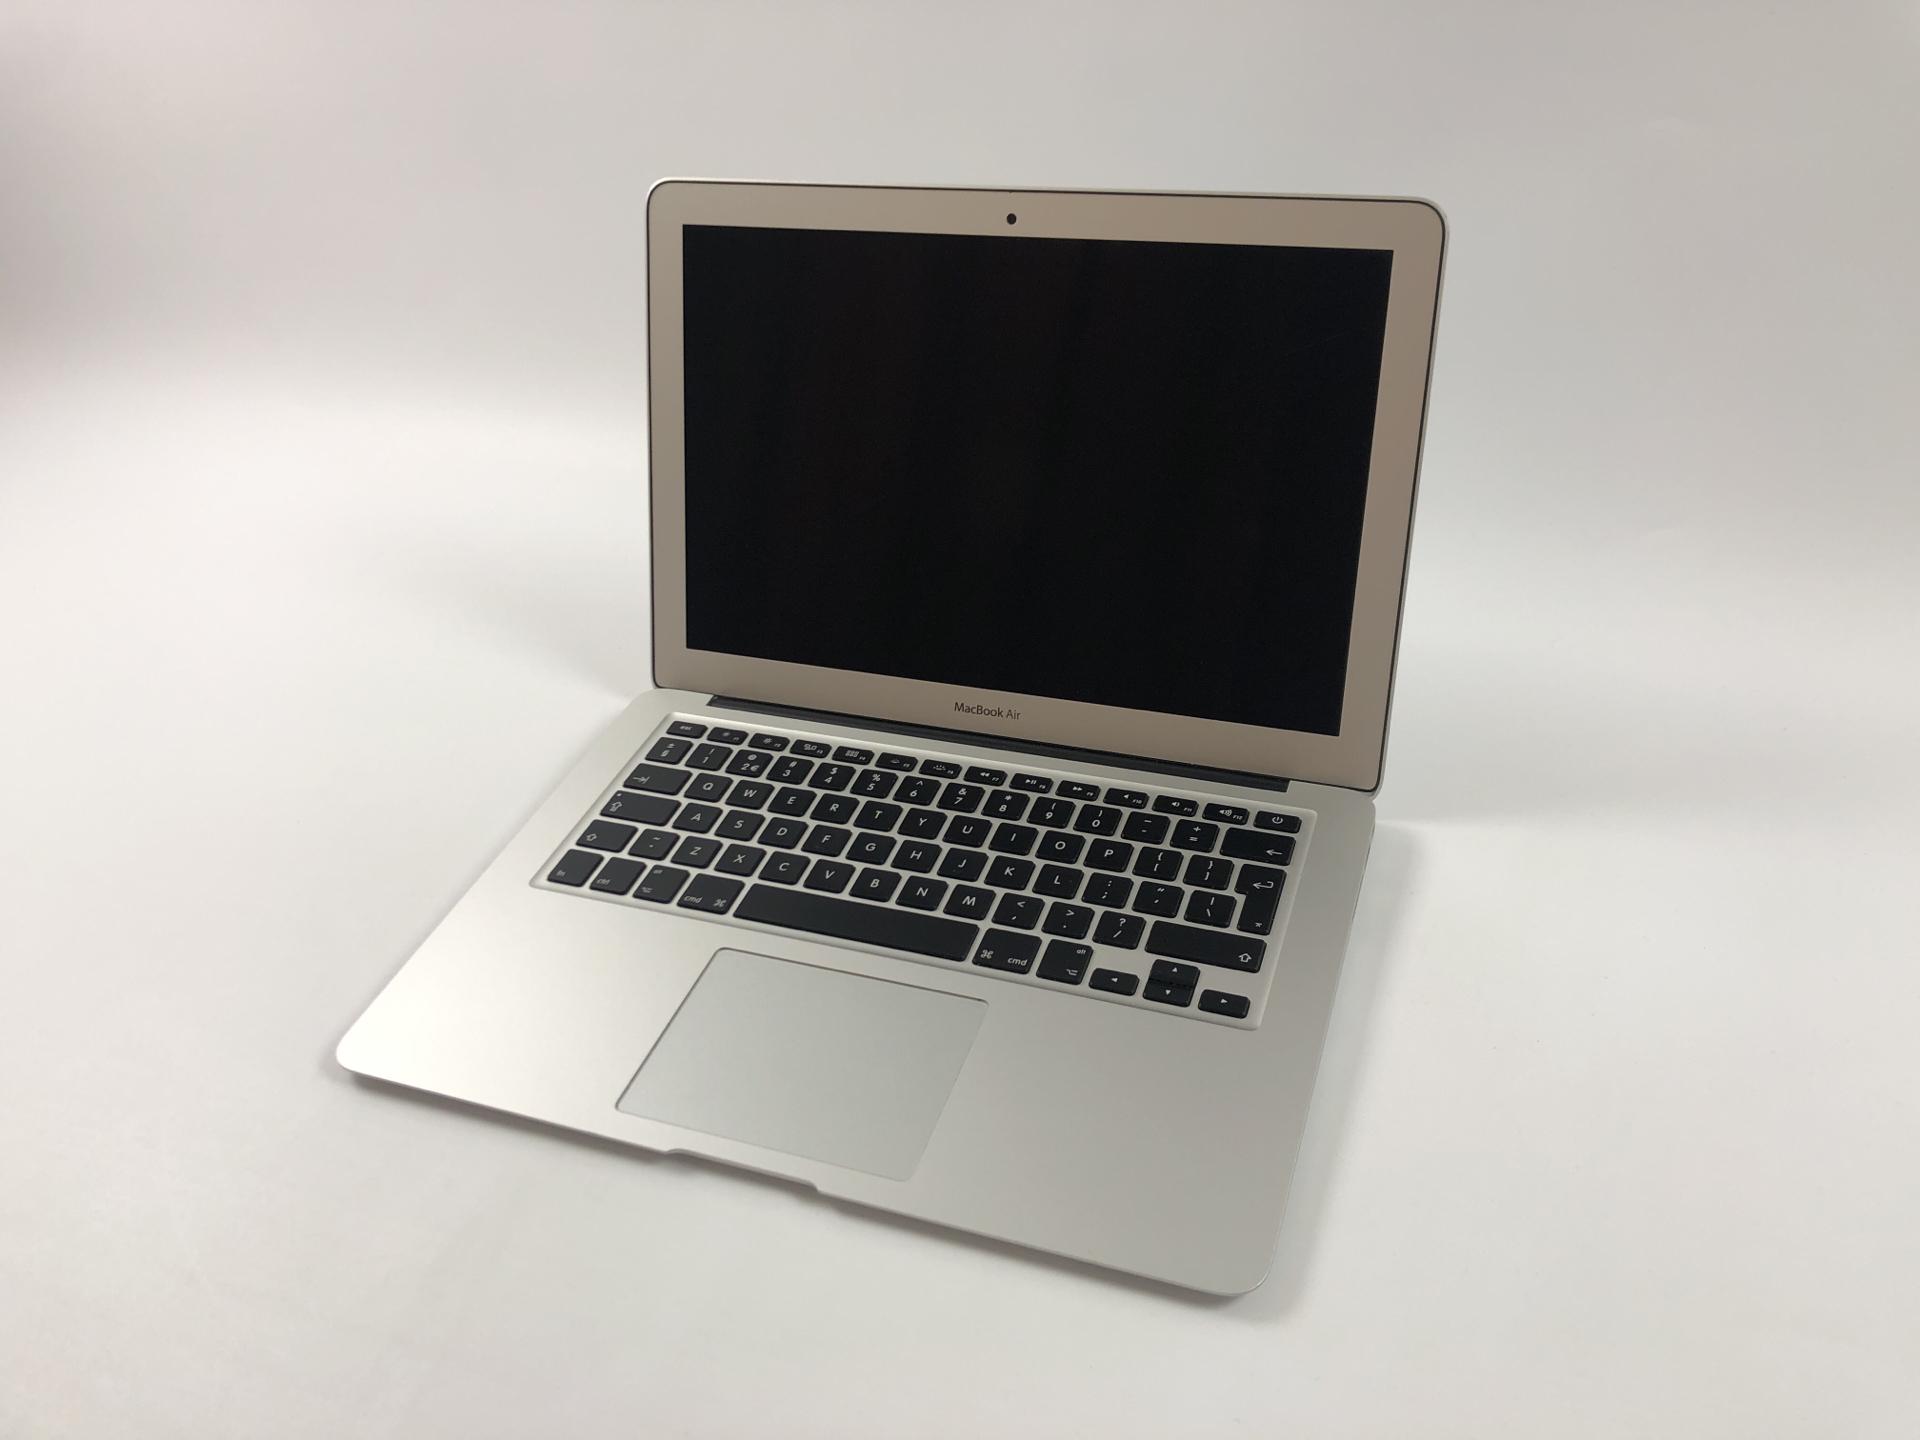 "MacBook Air 13"" Early 2015 (Intel Core i5 1.6 GHz 8 GB RAM 128 GB SSD), Intel Core i5 1.6 GHz, 8 GB RAM, 128 GB SSD, Afbeelding 1"